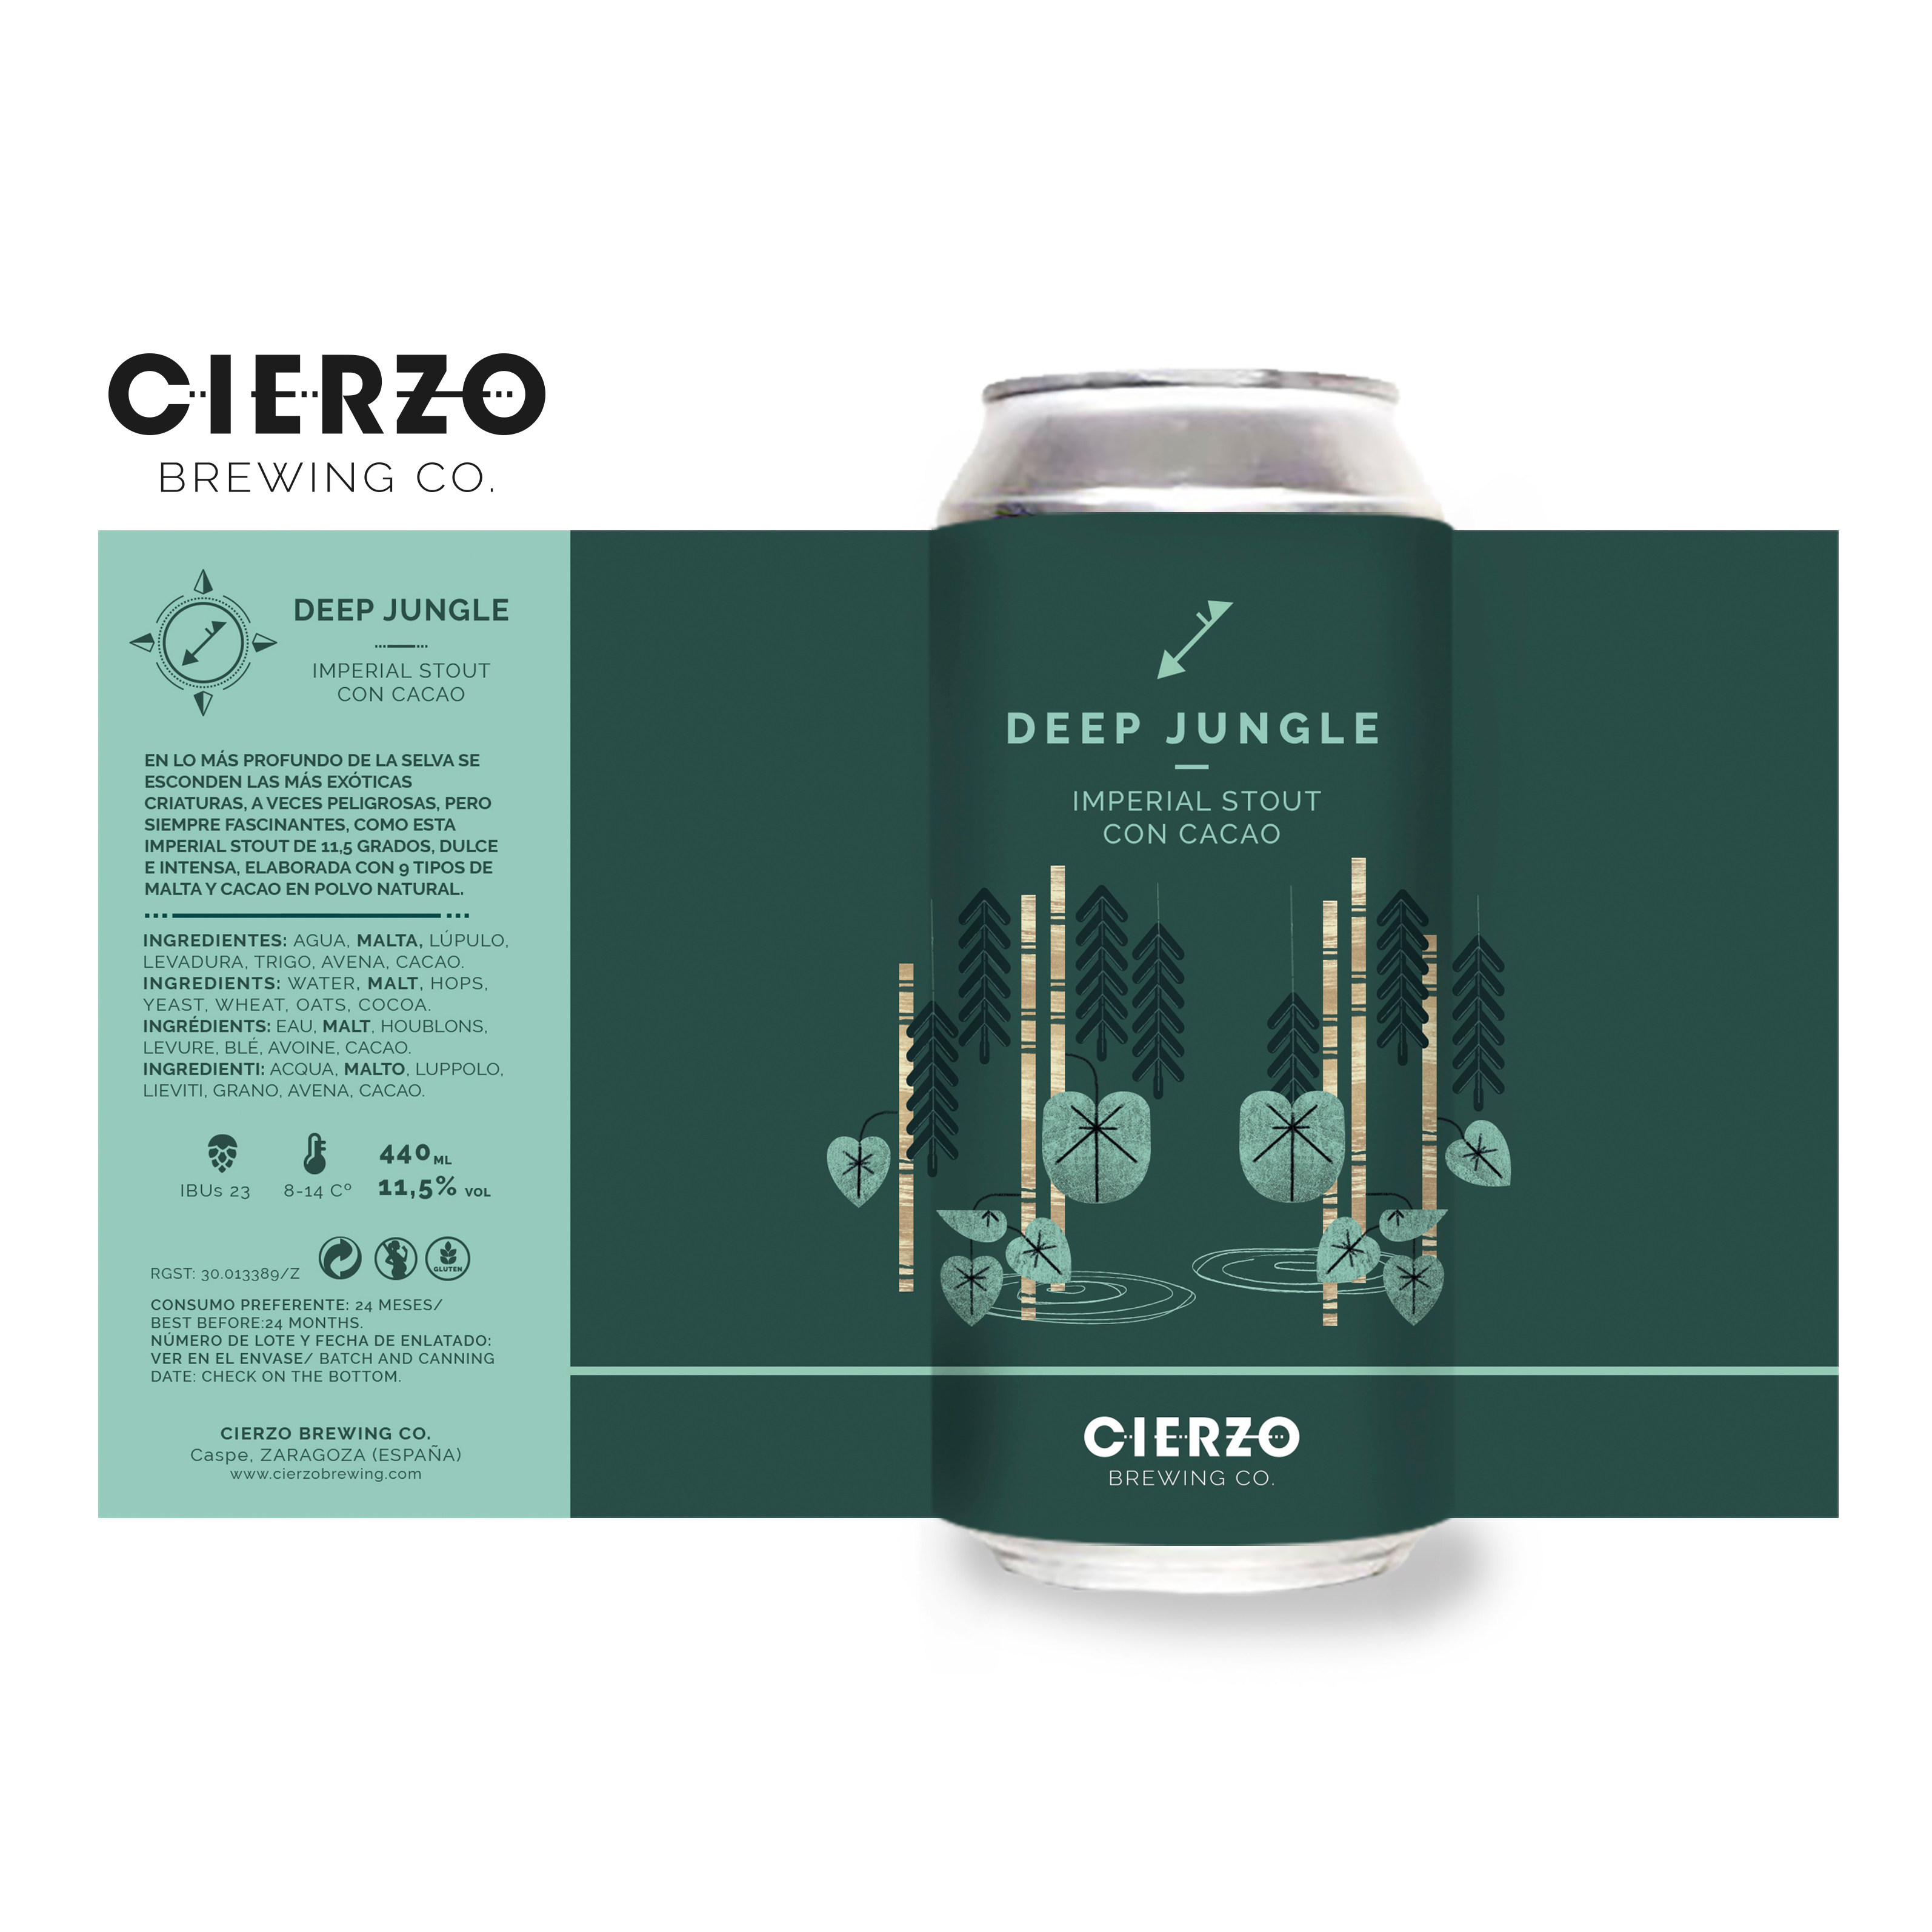 deep jungle cerveza imperial stout cacao zaragoza